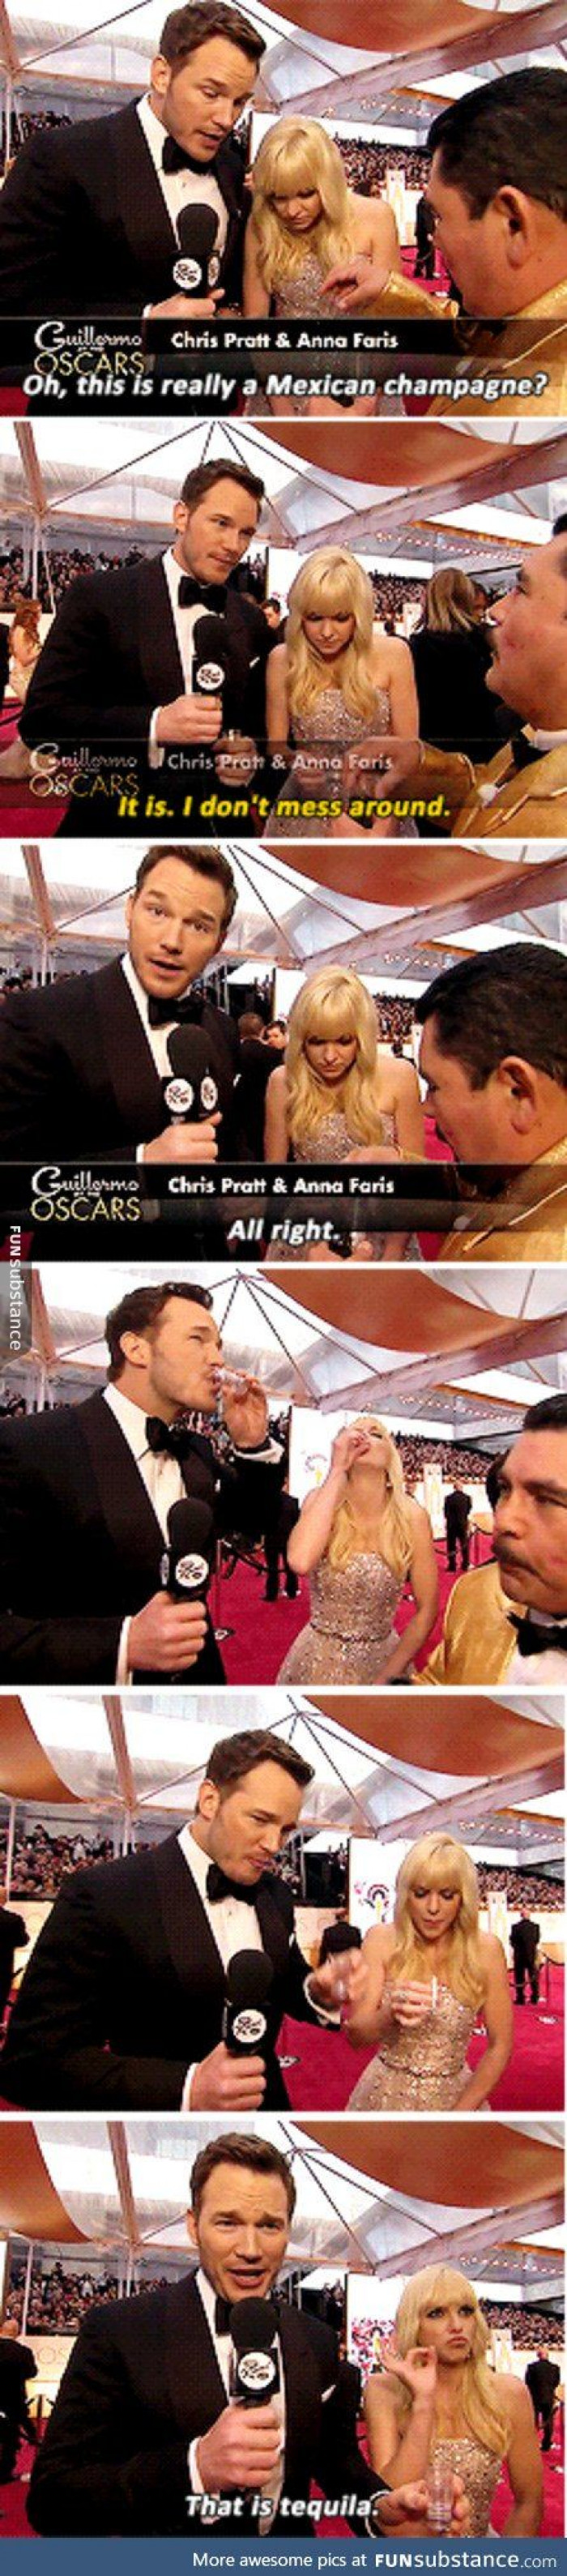 Chris Pratt Pranked